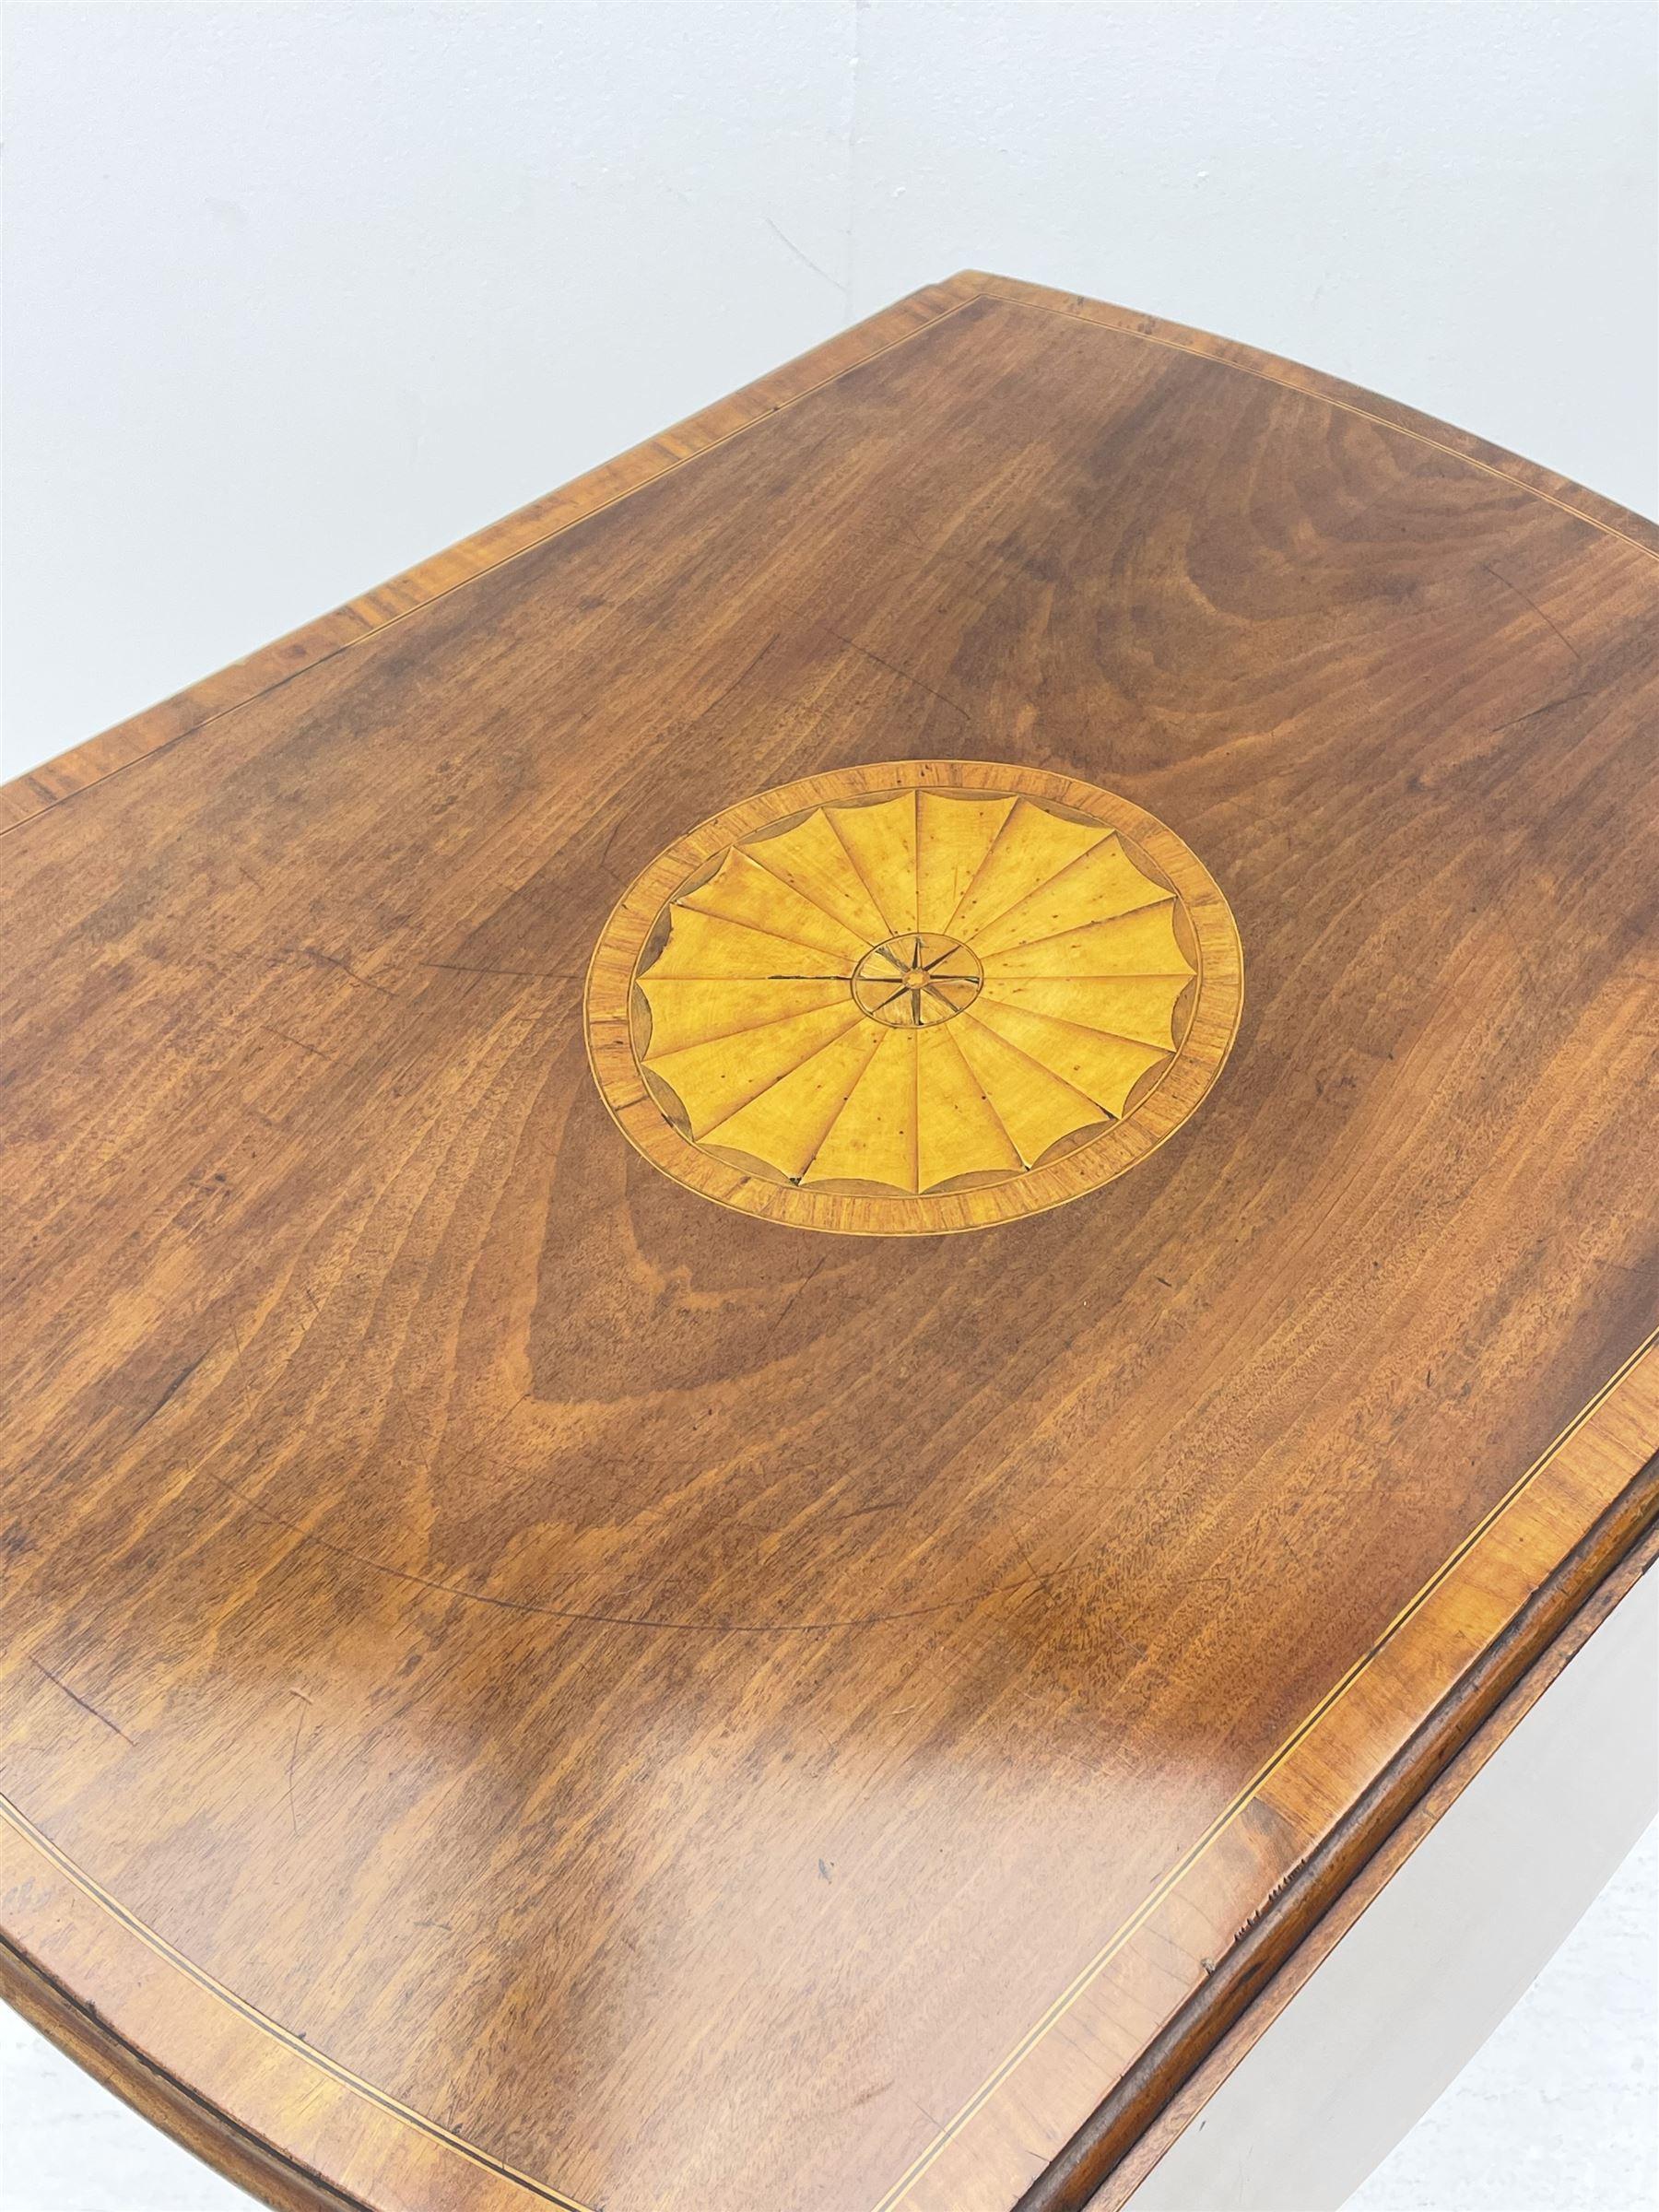 Sheraton period mahogany Pembroke table - Image 2 of 8